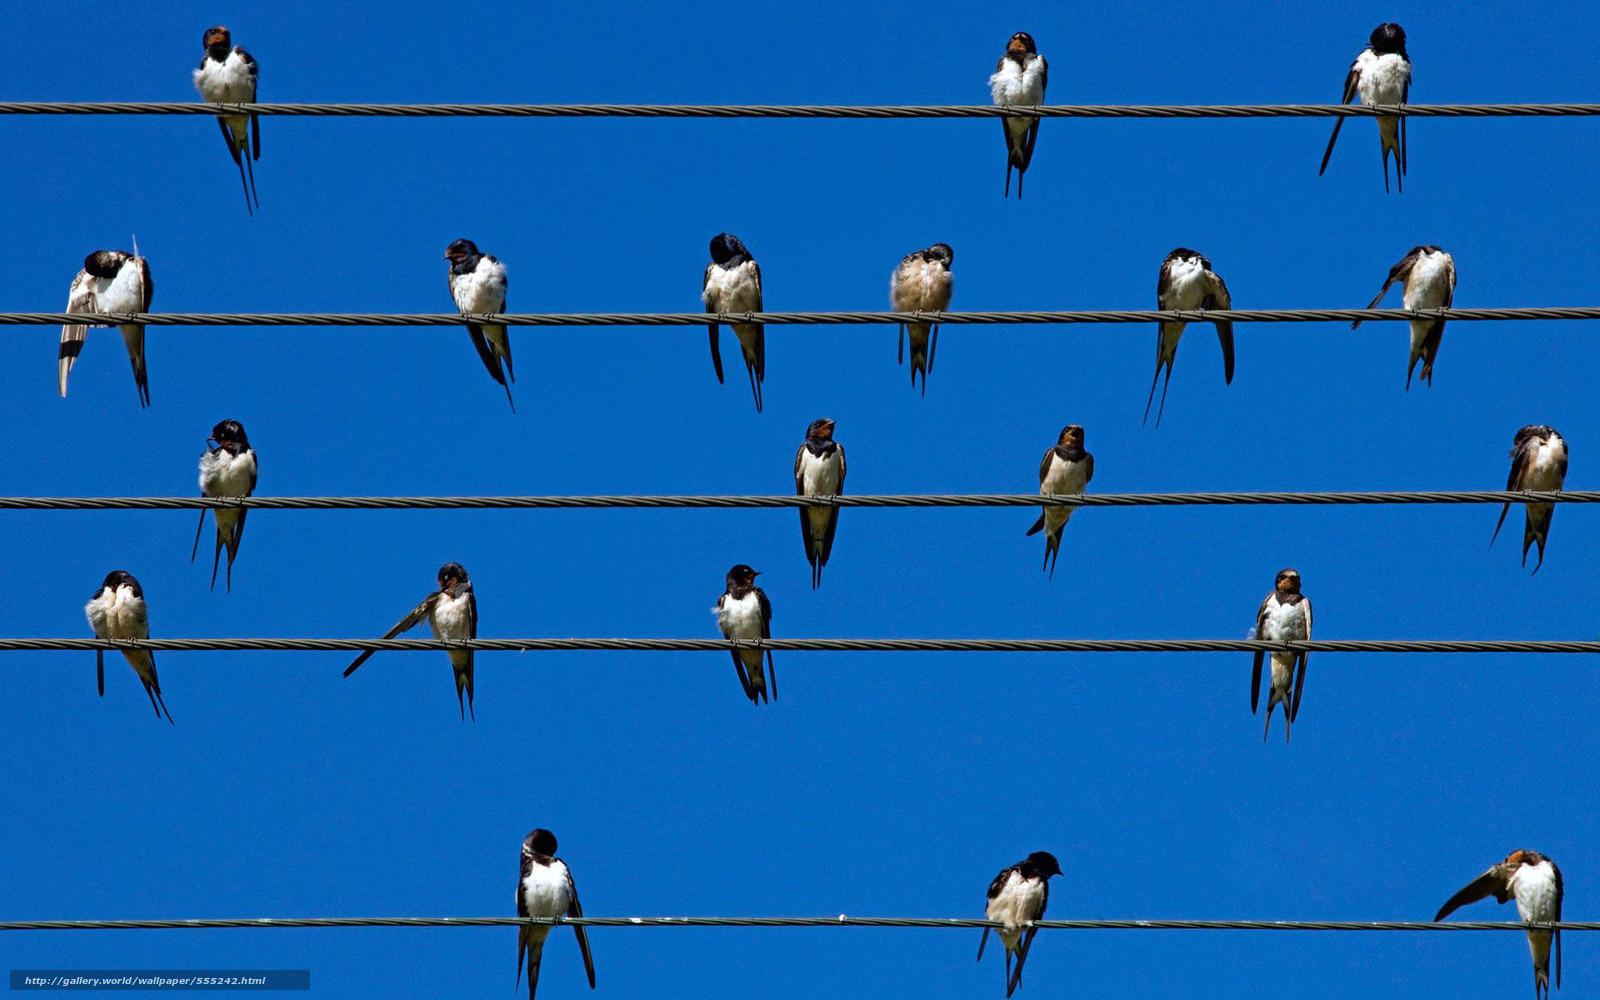 tlcharger fond d 39 ecran oiseaux martinets hirondelles. Black Bedroom Furniture Sets. Home Design Ideas